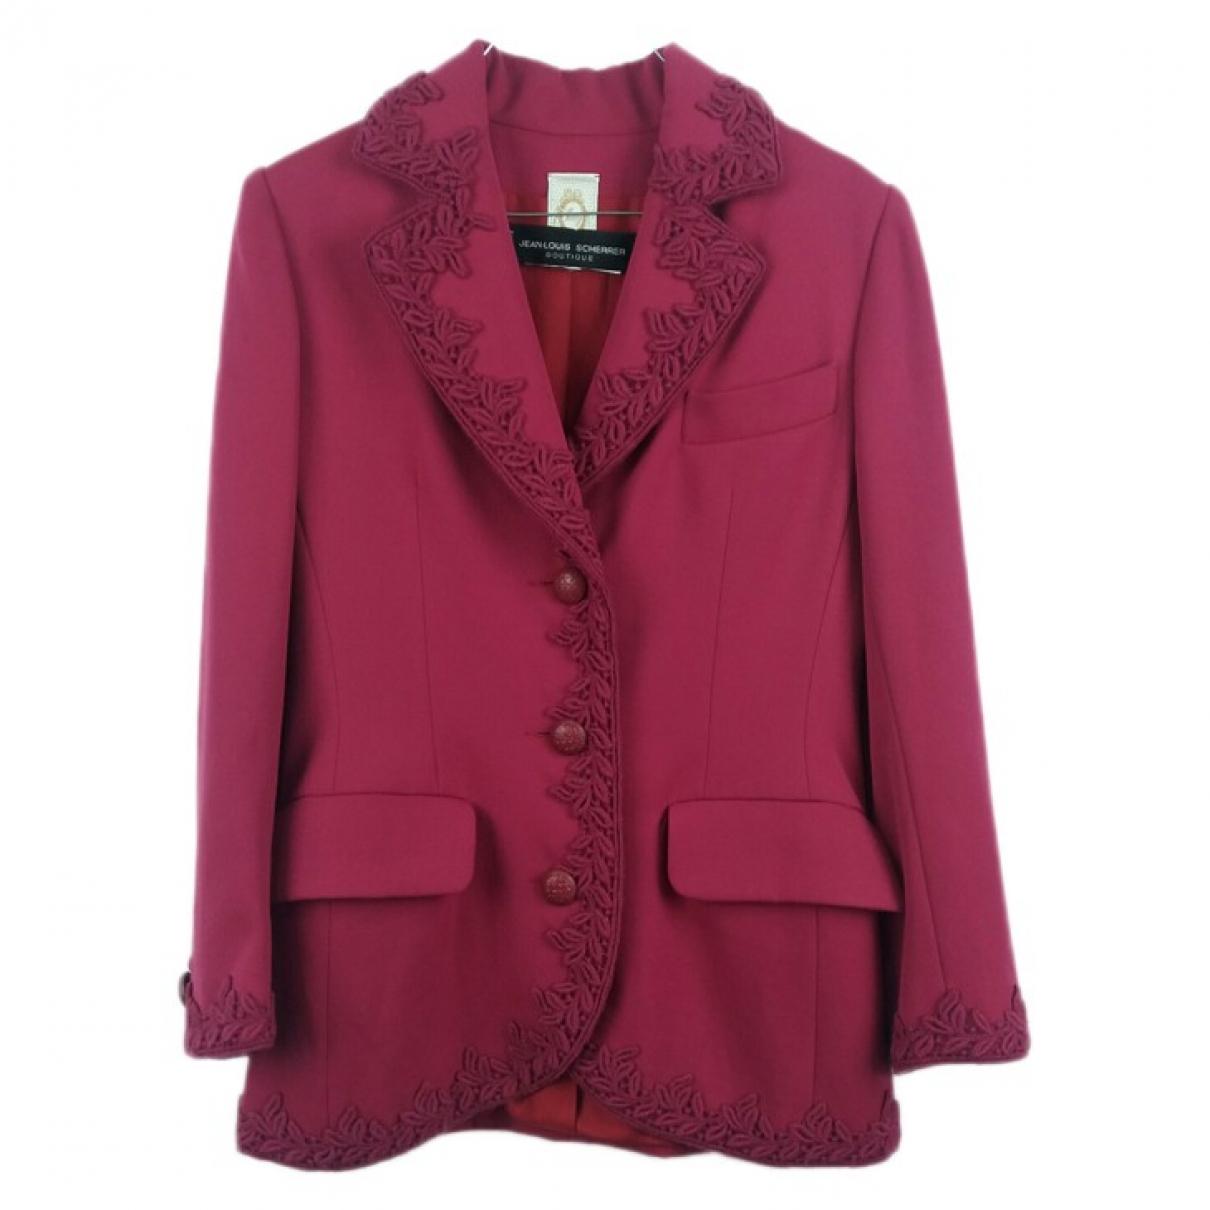 Jean-louis Scherrer \N Pink jacket for Women 42 FR